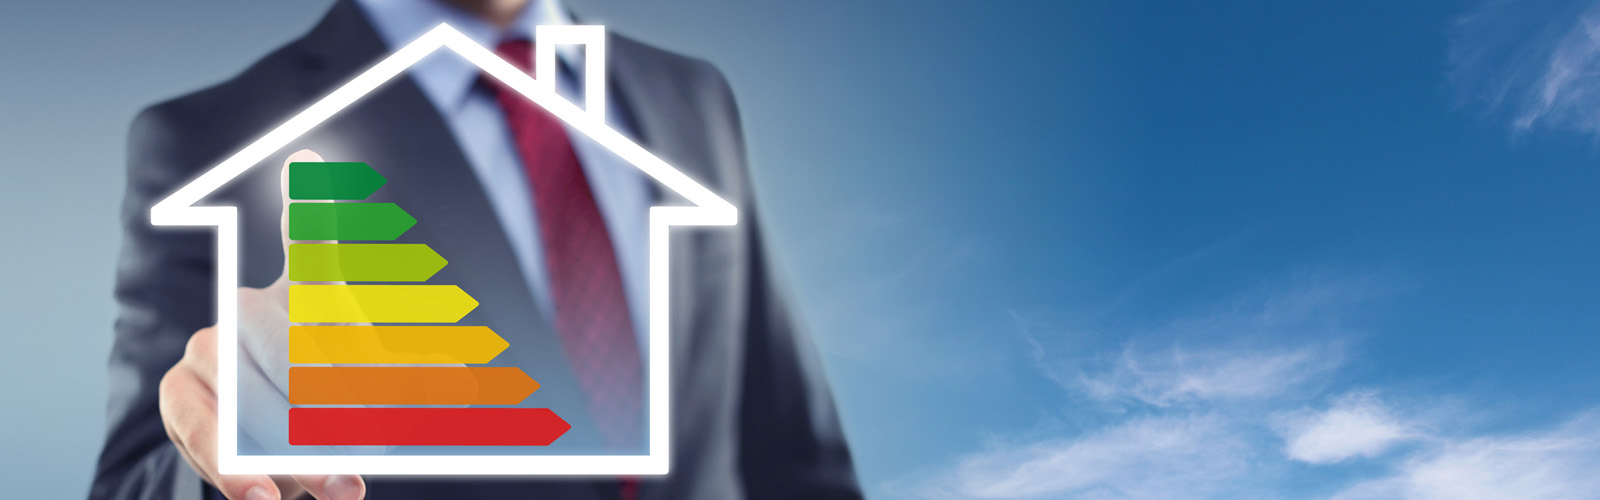 Daniel Kieck Immobilien - Bedarfs- und Verbrauchsbasierte Energieausweise